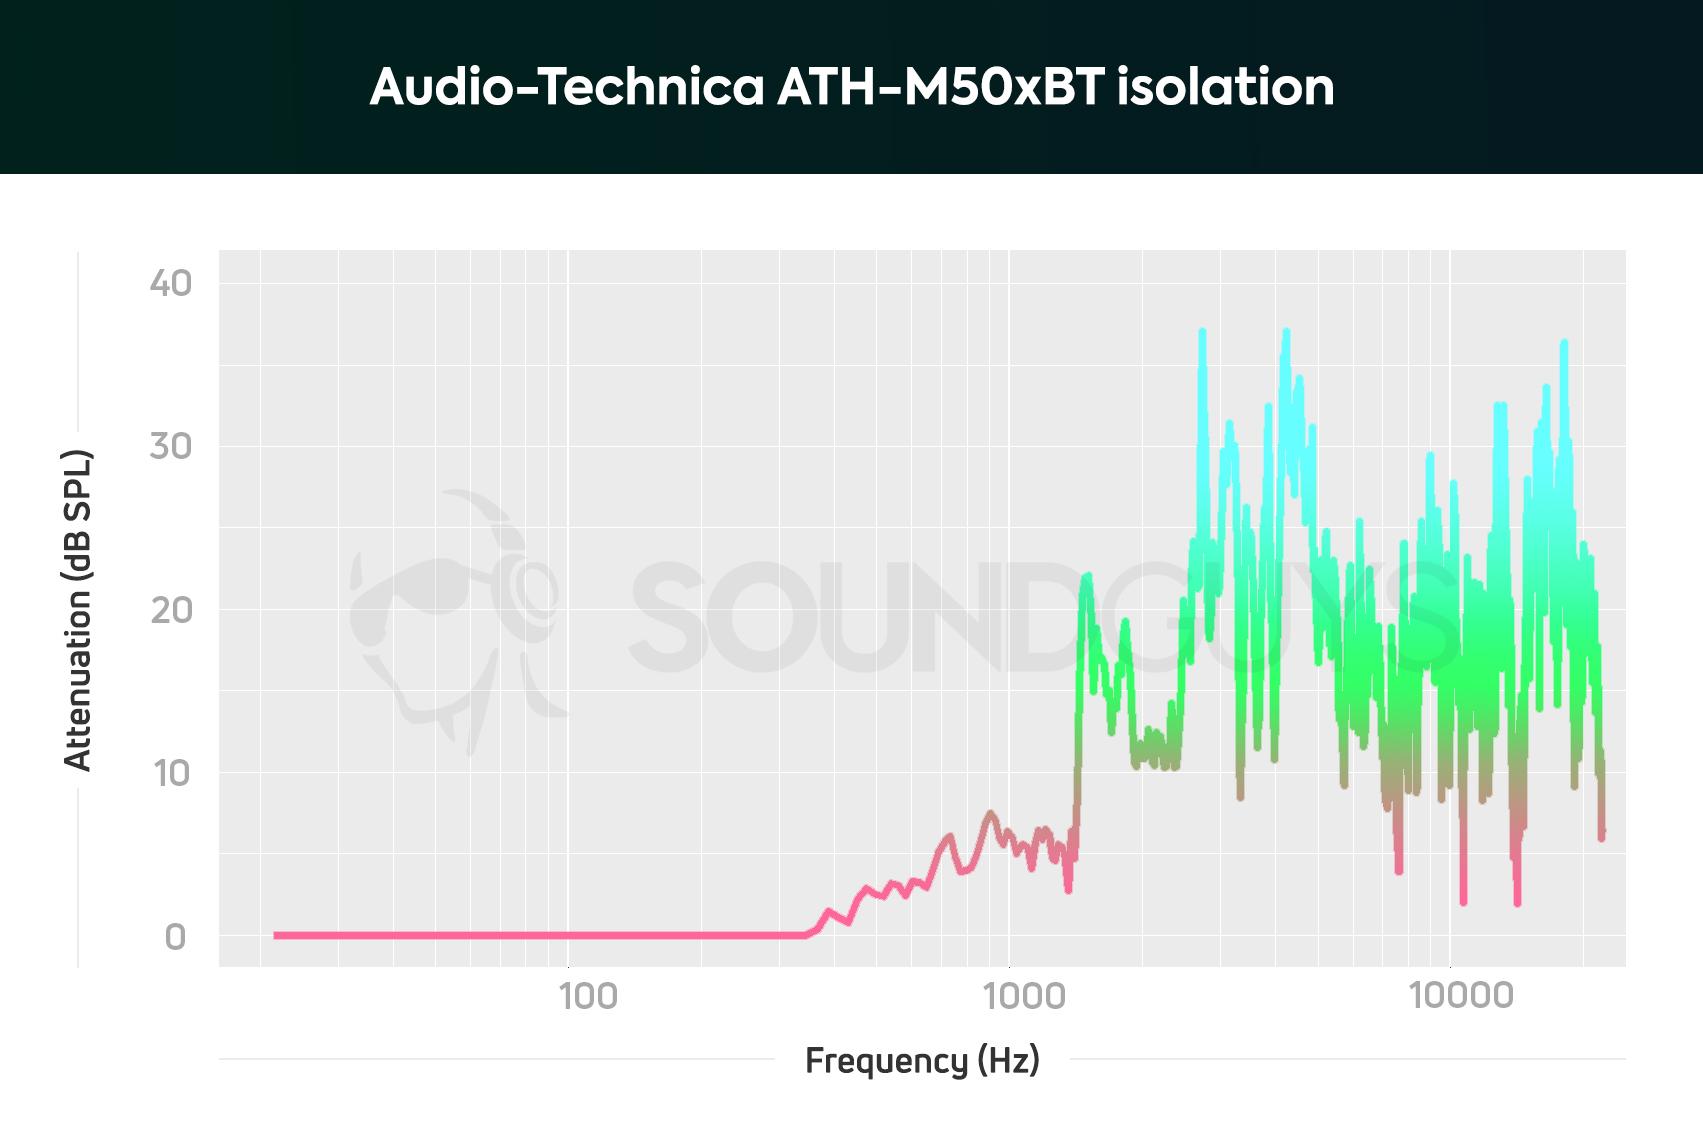 audio technica ath m50xbt isolation chart